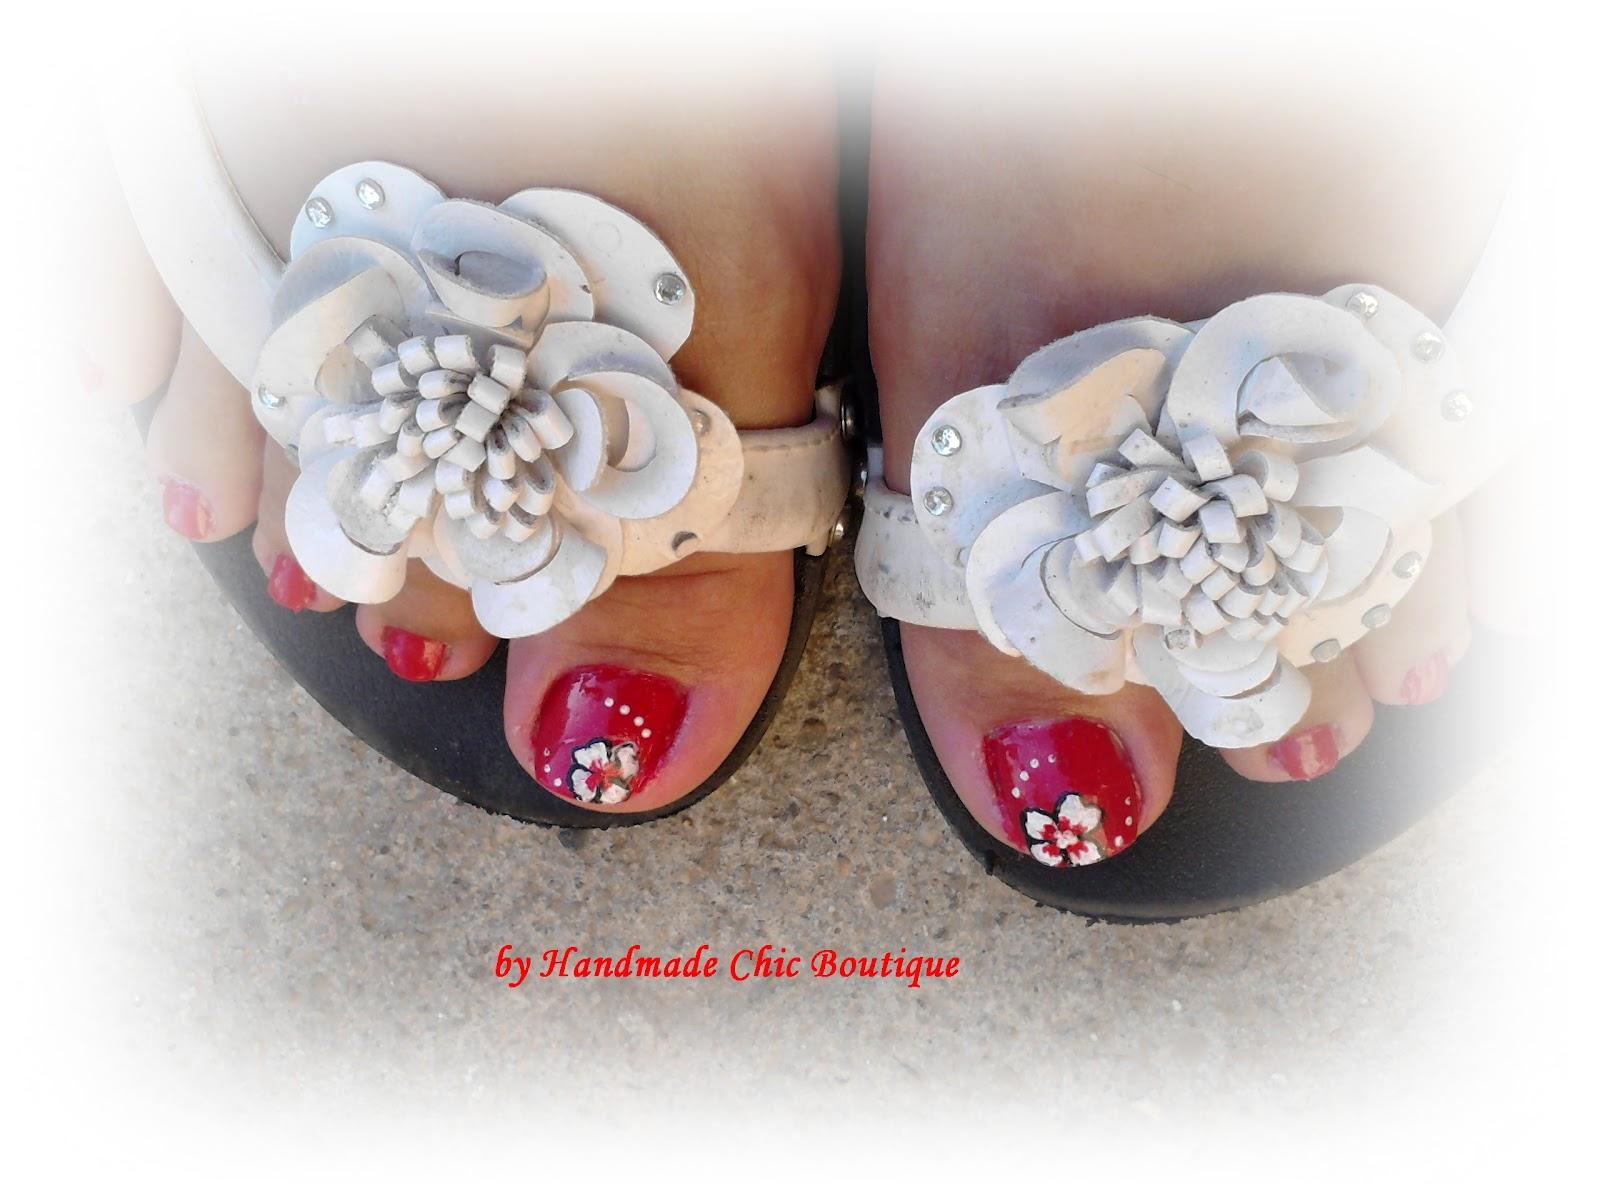 Handmade Chic Boutique Manichiura Pedichiura Unghii Scurte